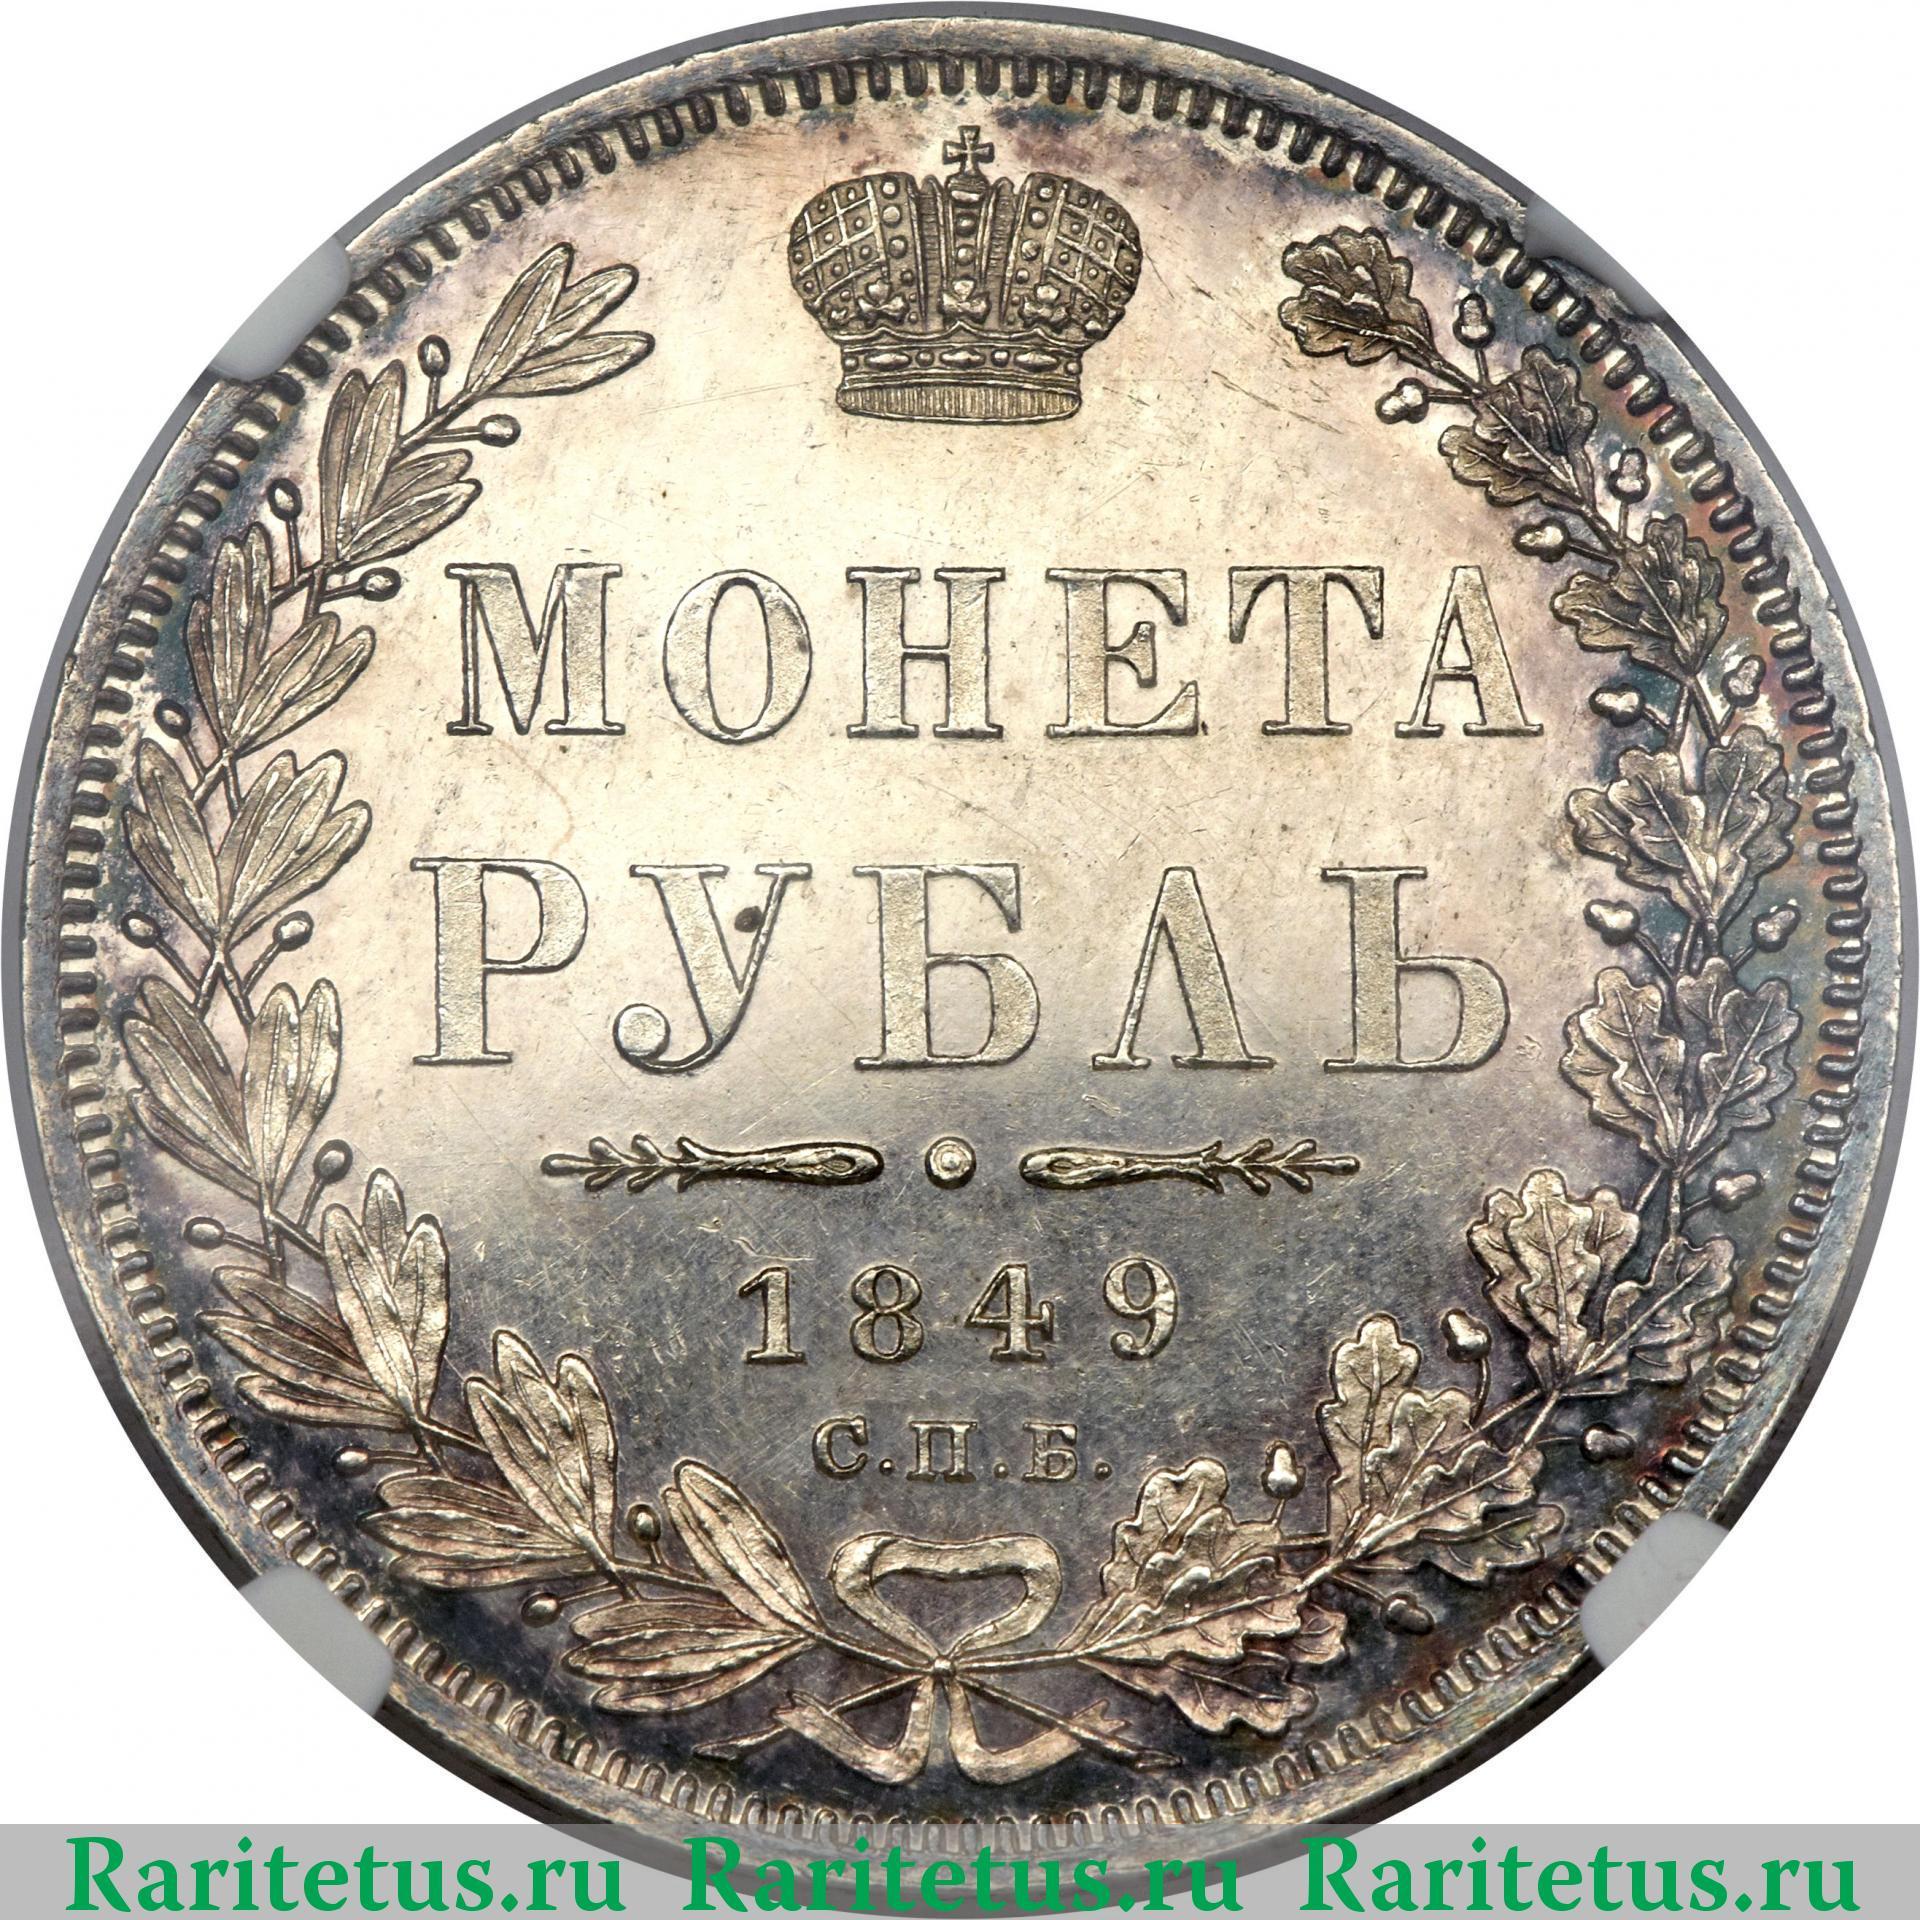 Монета рубль 1849 года цена магазин раритет в мурманске